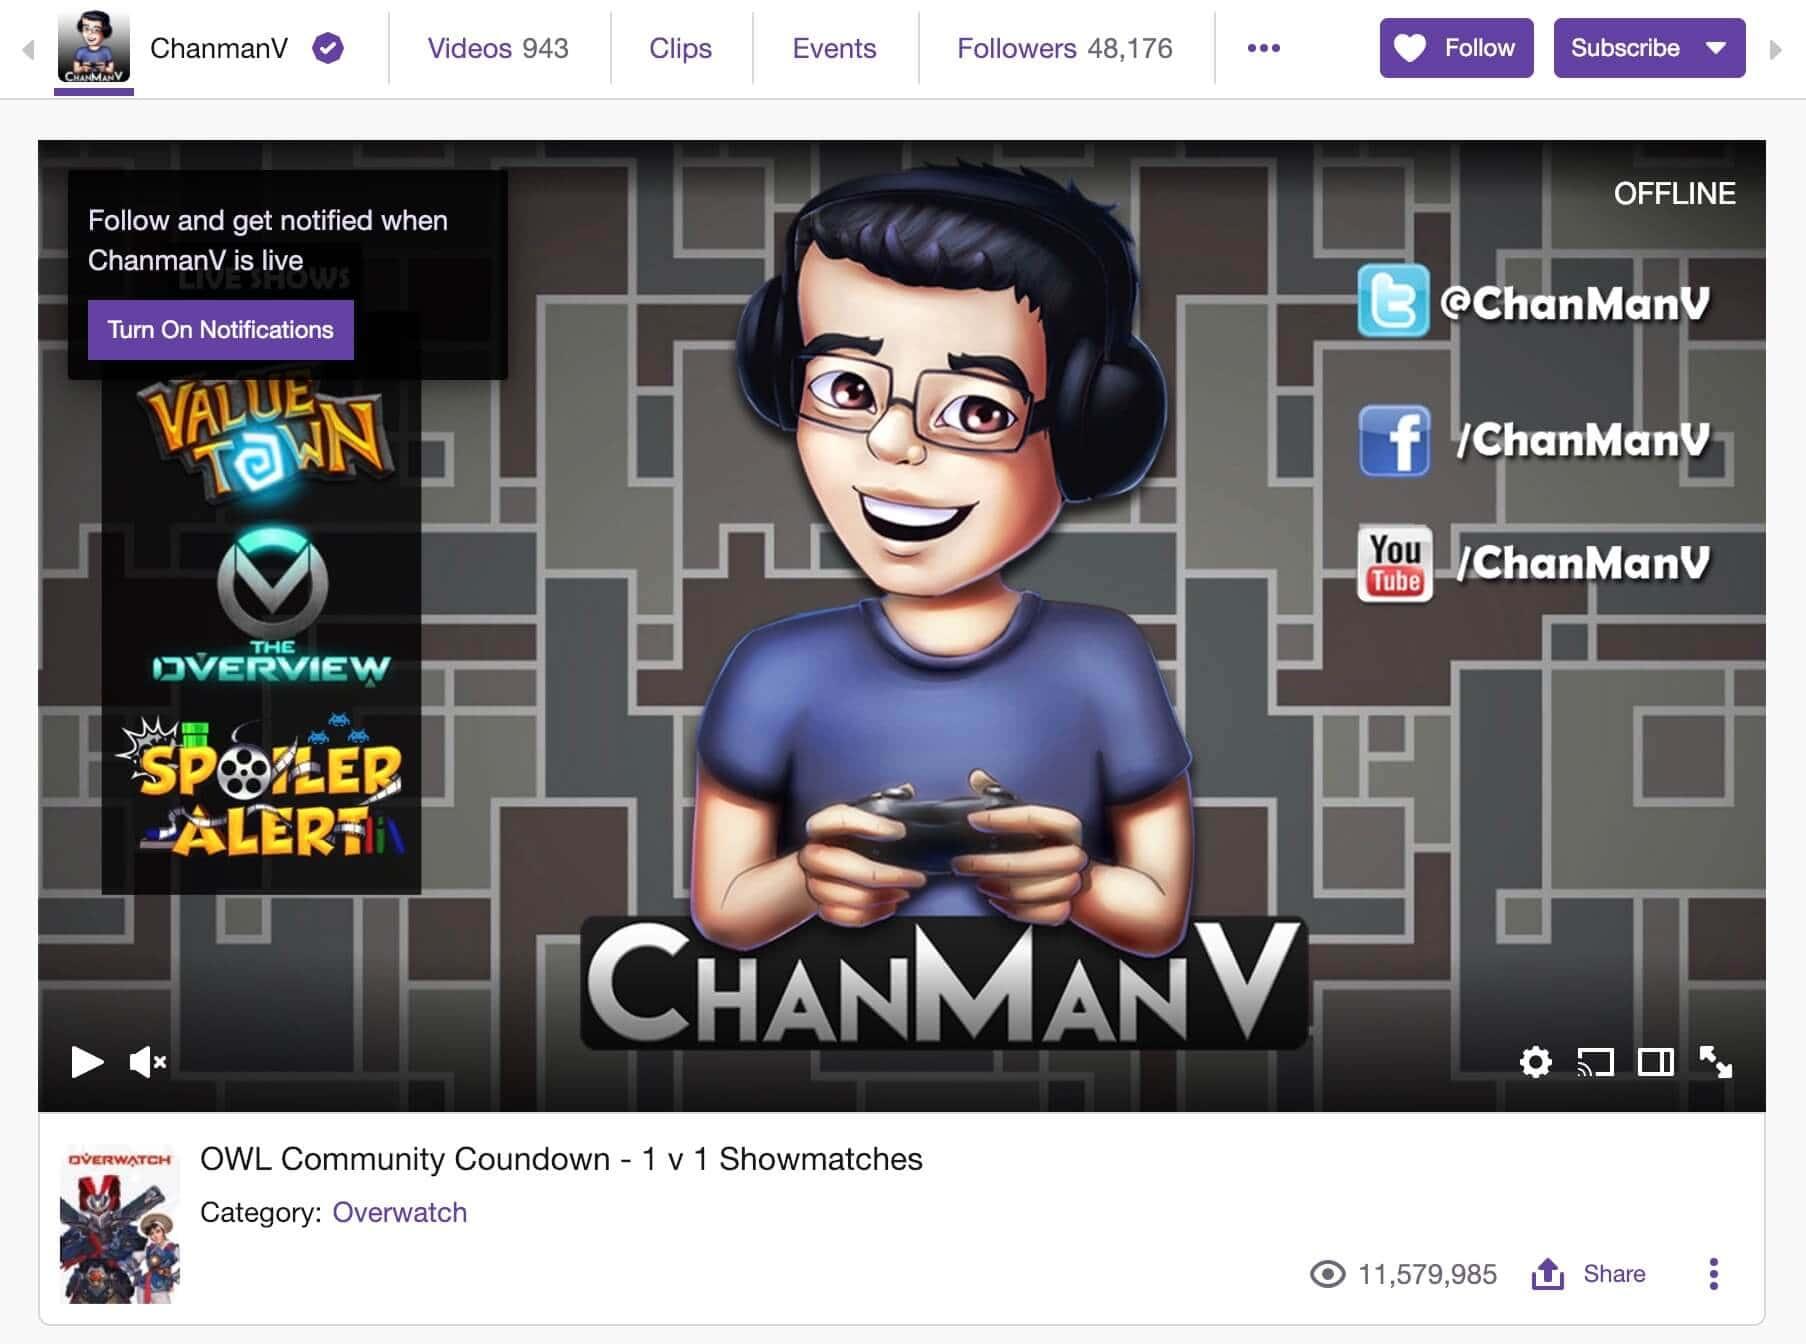 chanman twitch offline end screen